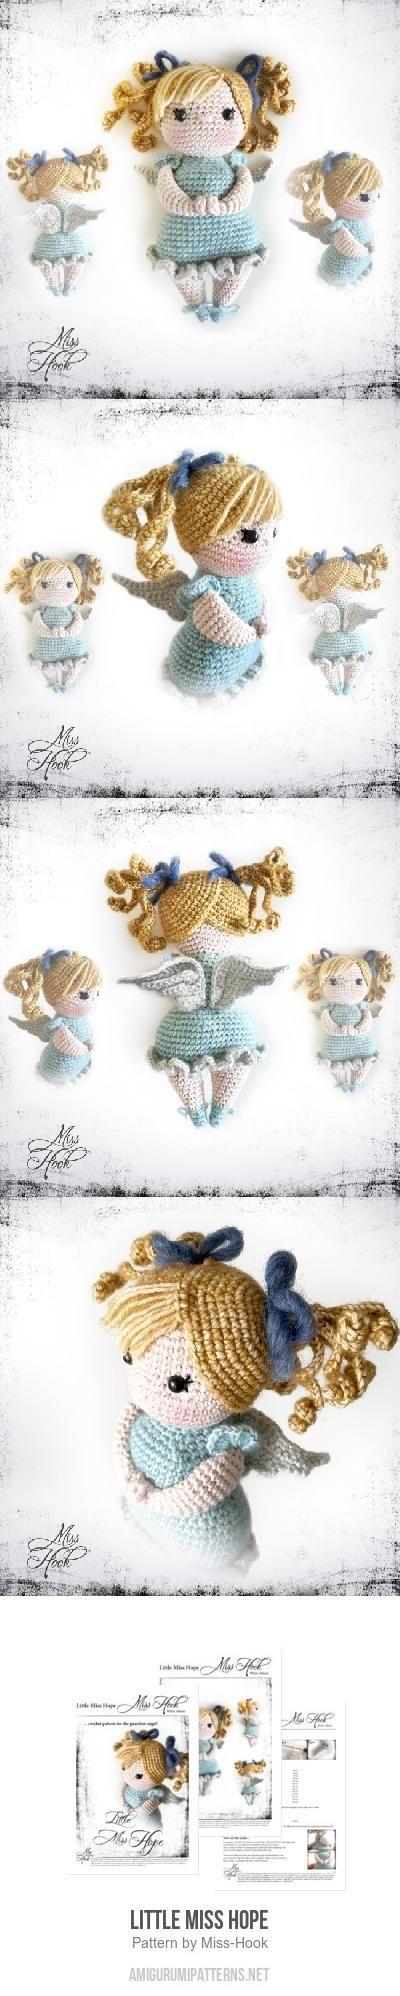 Little Miss Hope amigurumi pattern